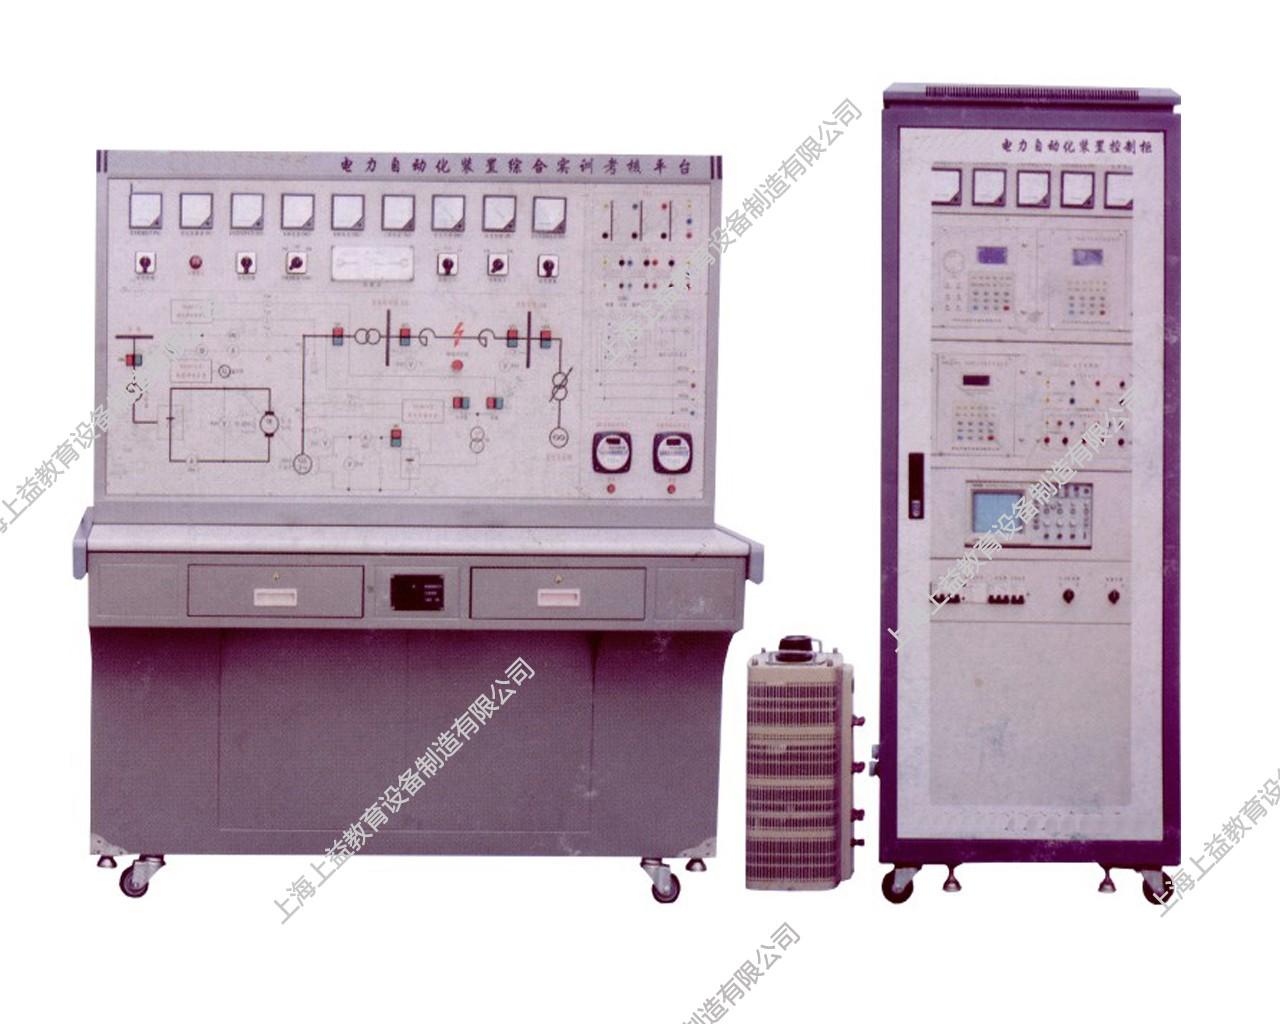 SYDLZD-02型电力自动化装置综合wwwlehu8viplehu68vip平台